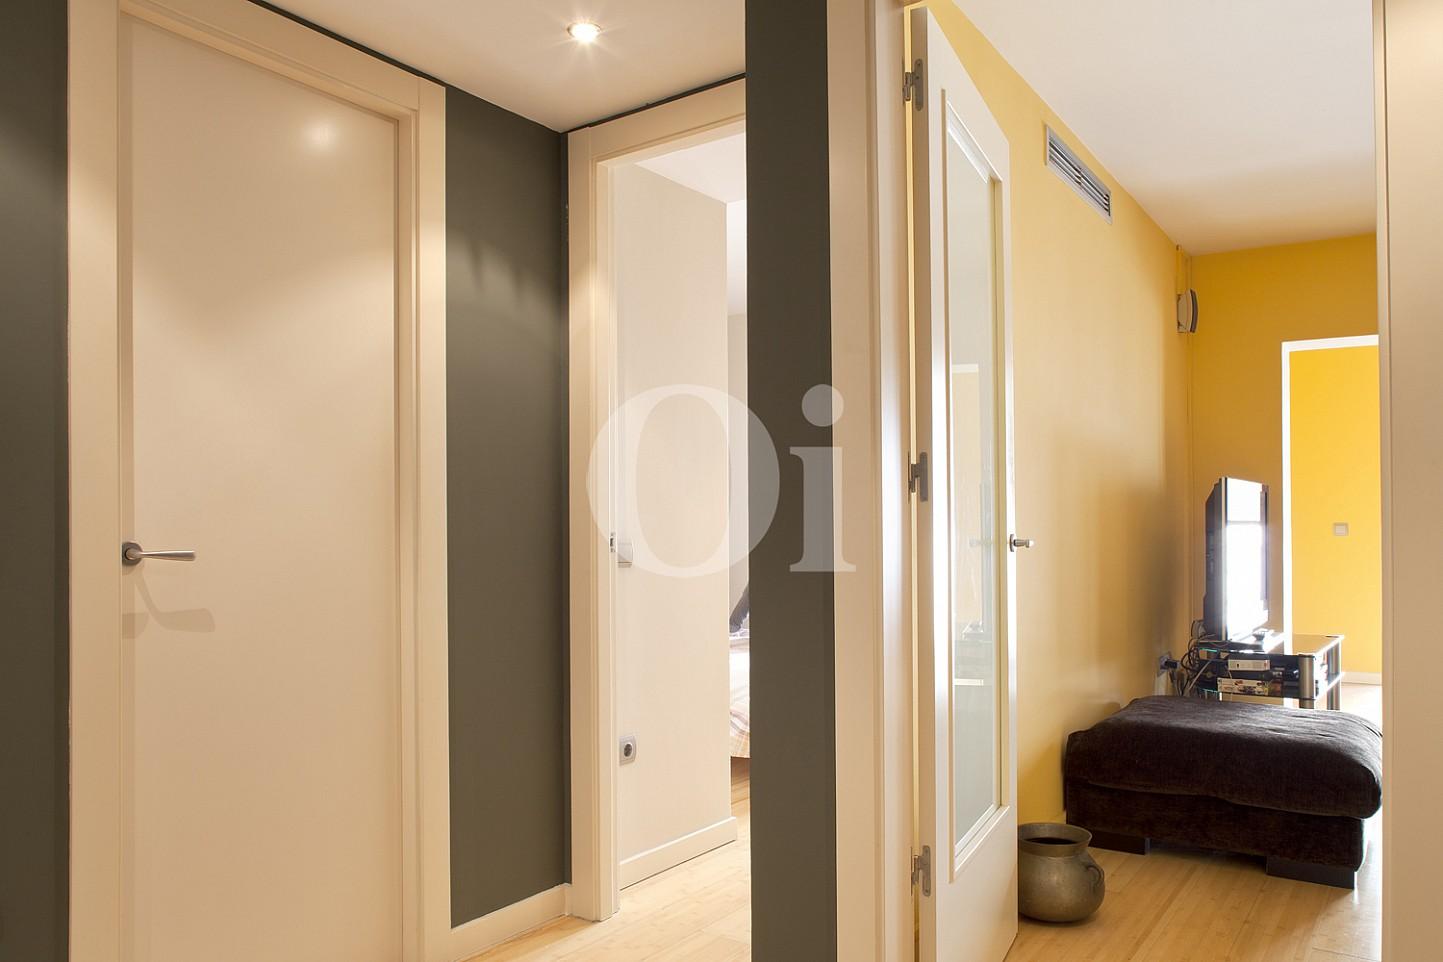 pasillo, luminoso, habitación, baño, distribuidor